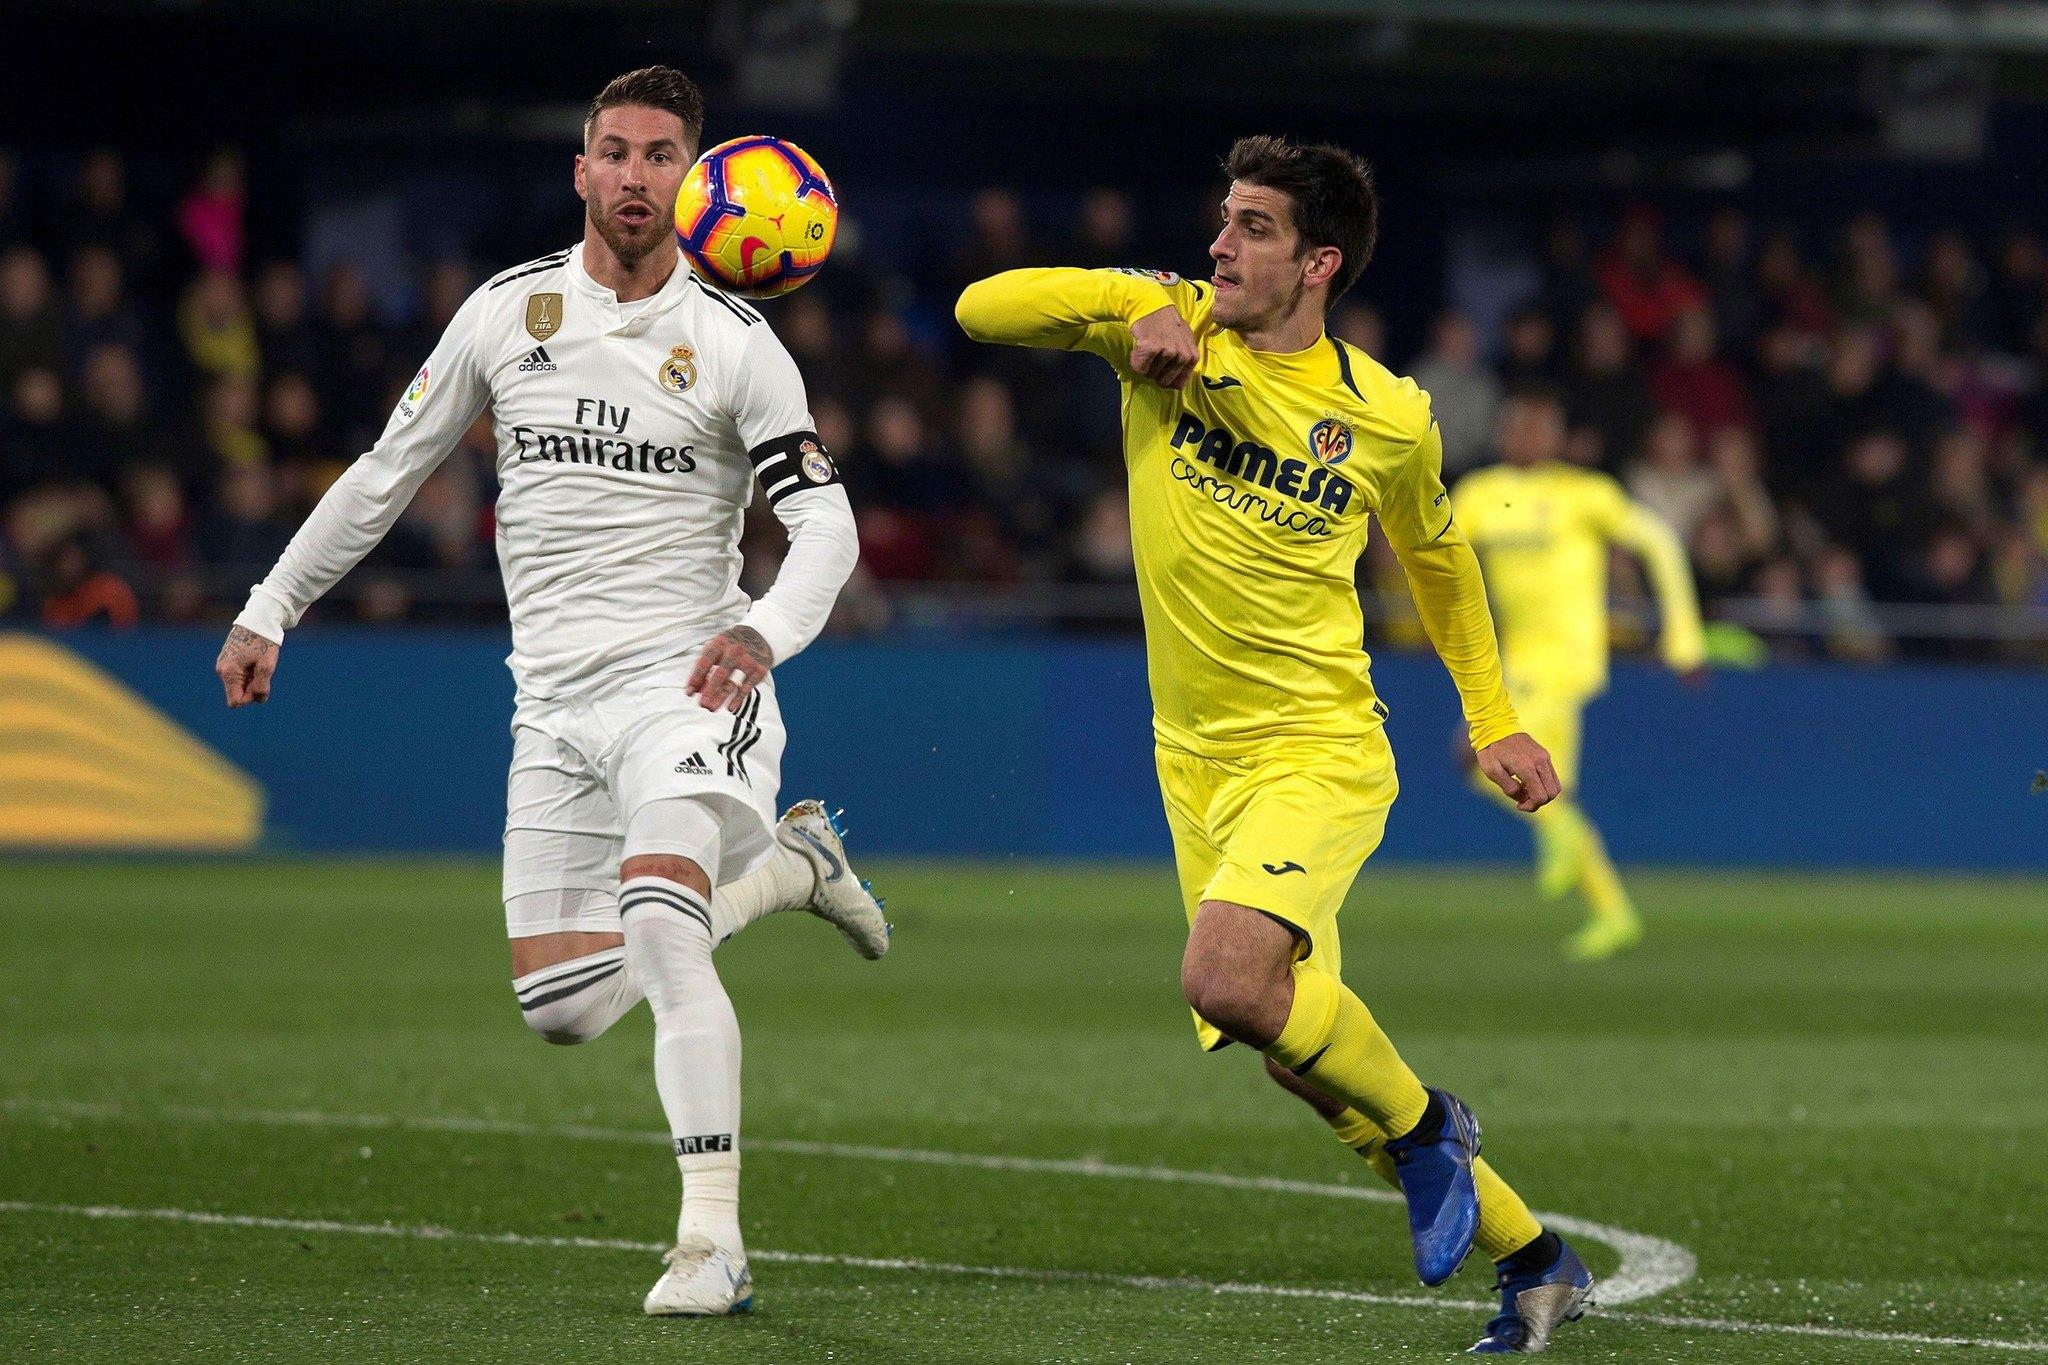 La Liga: Villarreal vs Real Madrid Preview